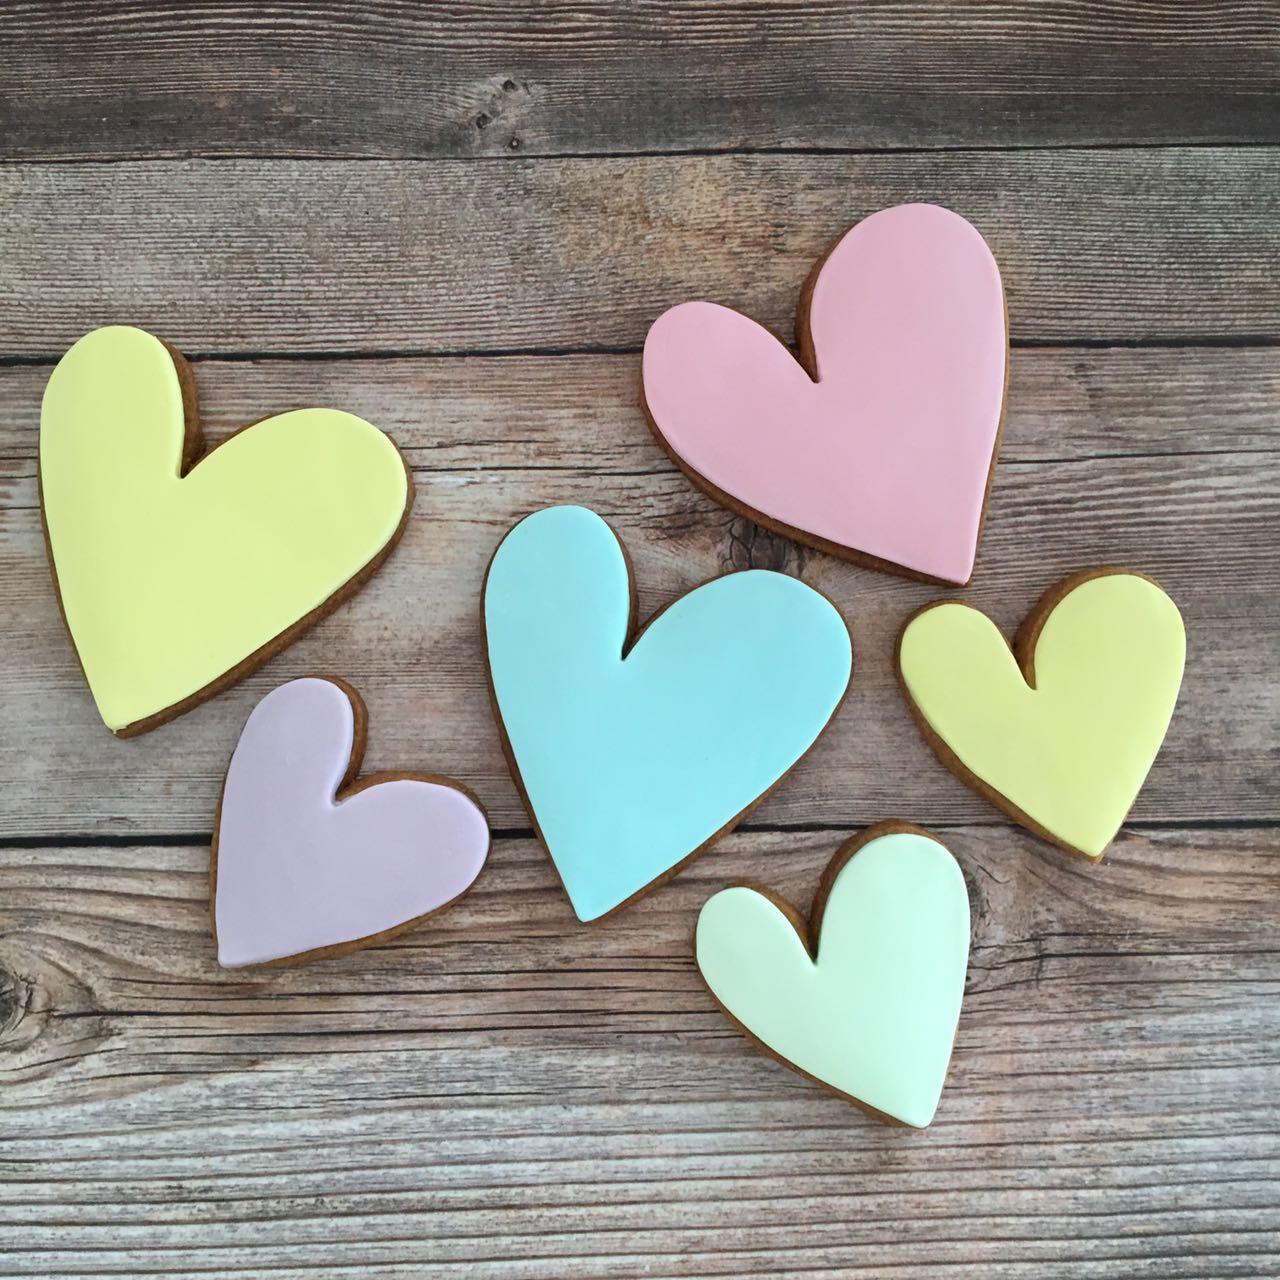 Pastel colored fondant heart cookies